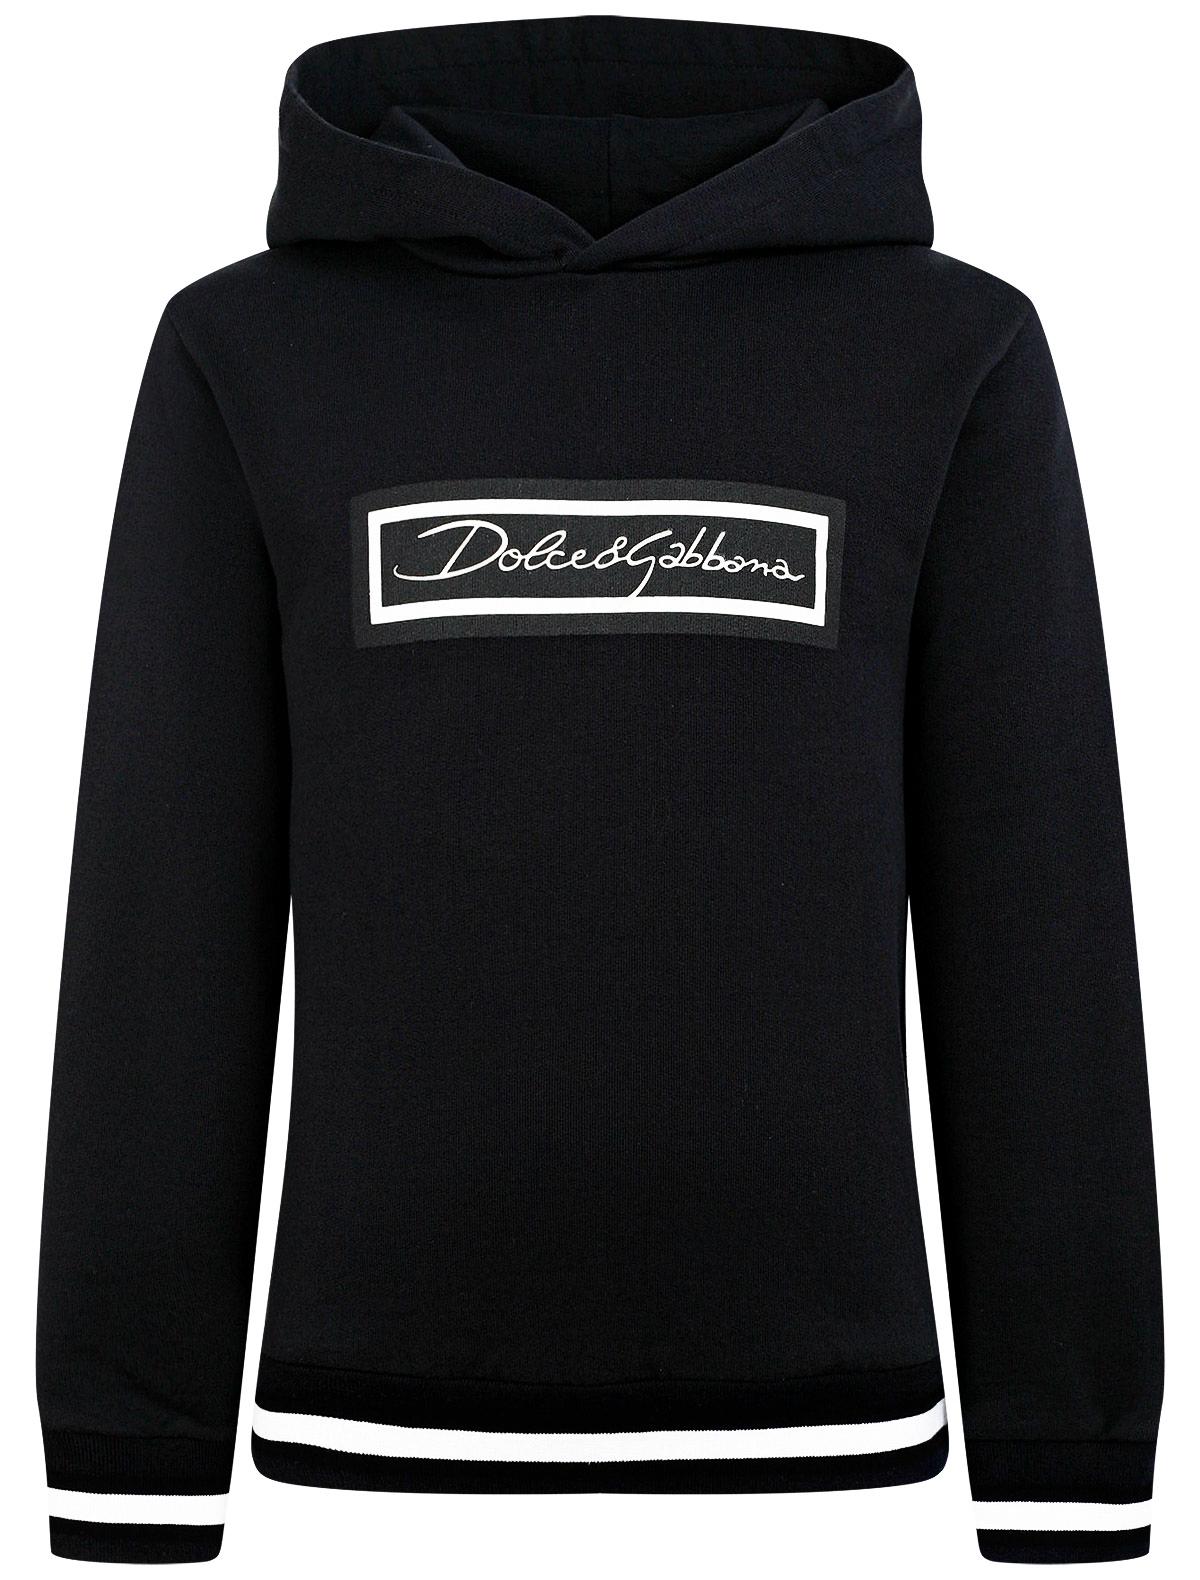 2296215, Худи Dolce & Gabbana, синий, 0094529170894  - купить со скидкой